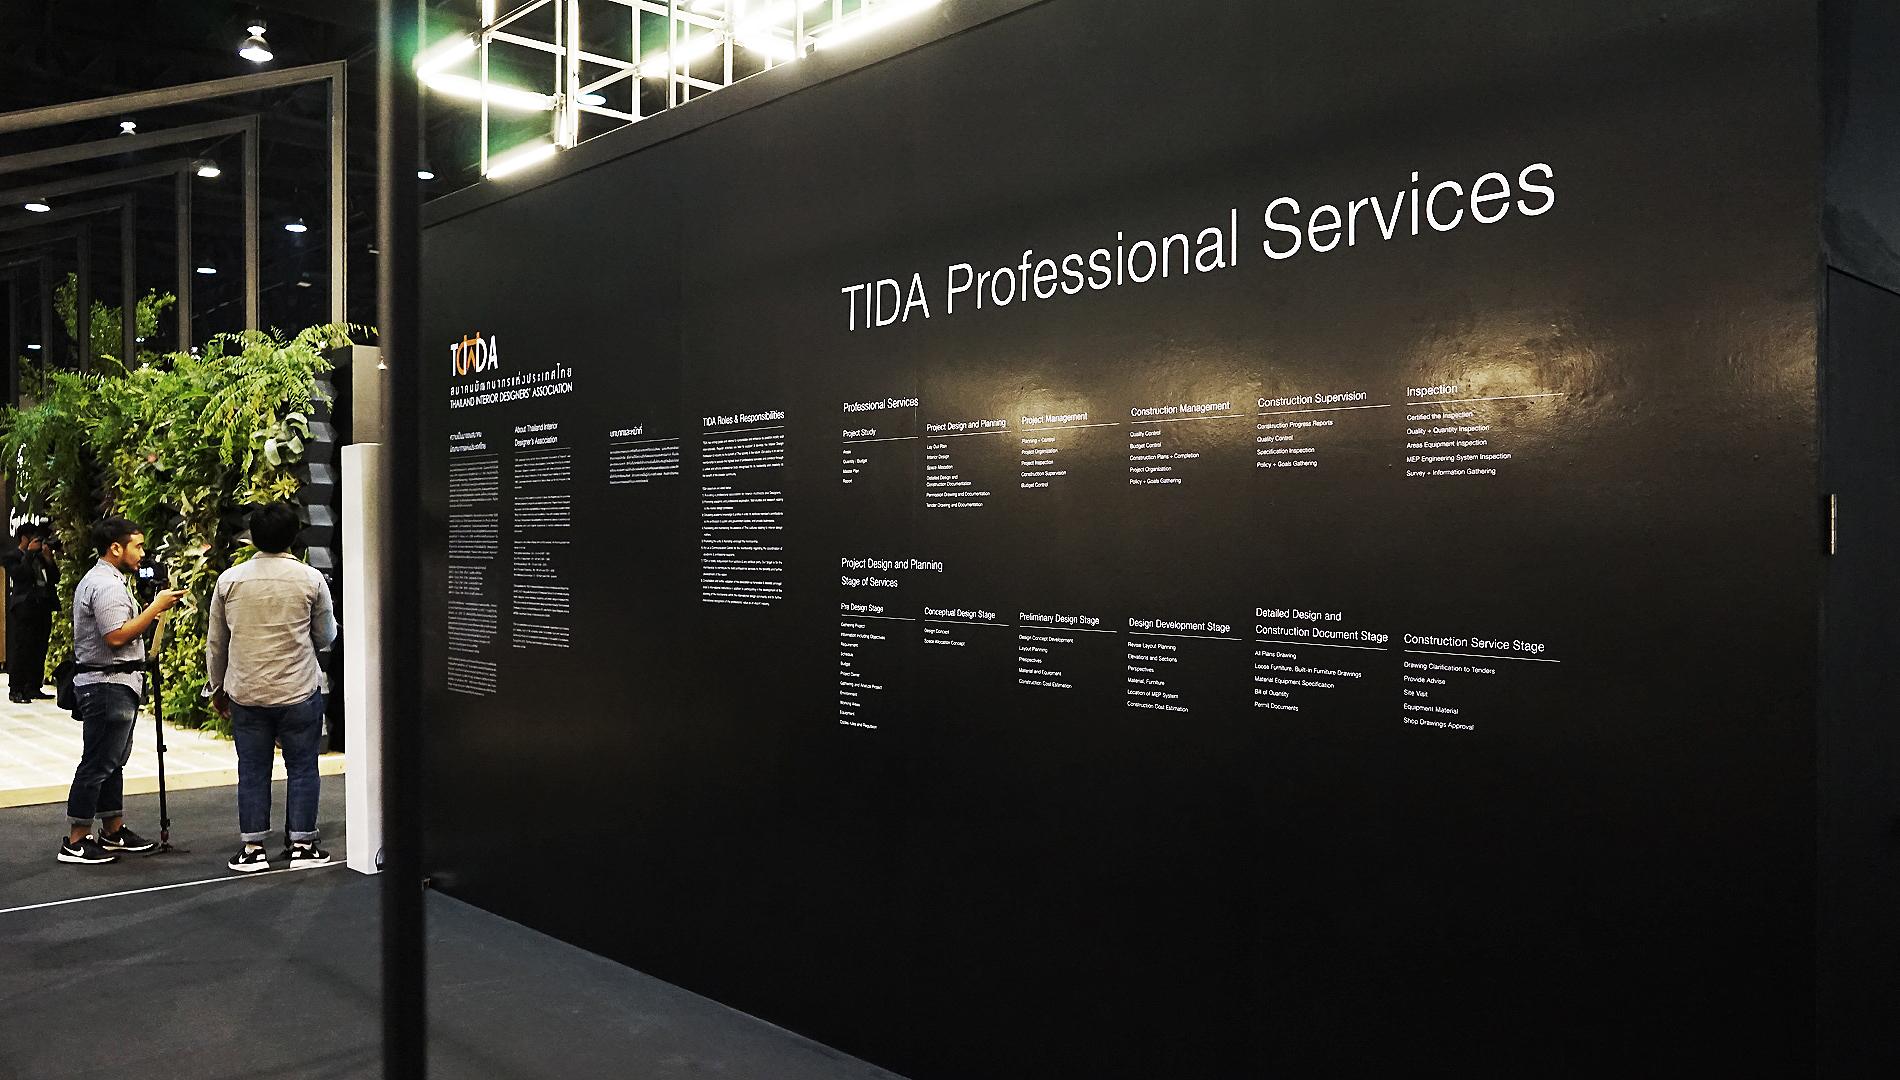 tbt-daf_tida 2015_exhibition 4